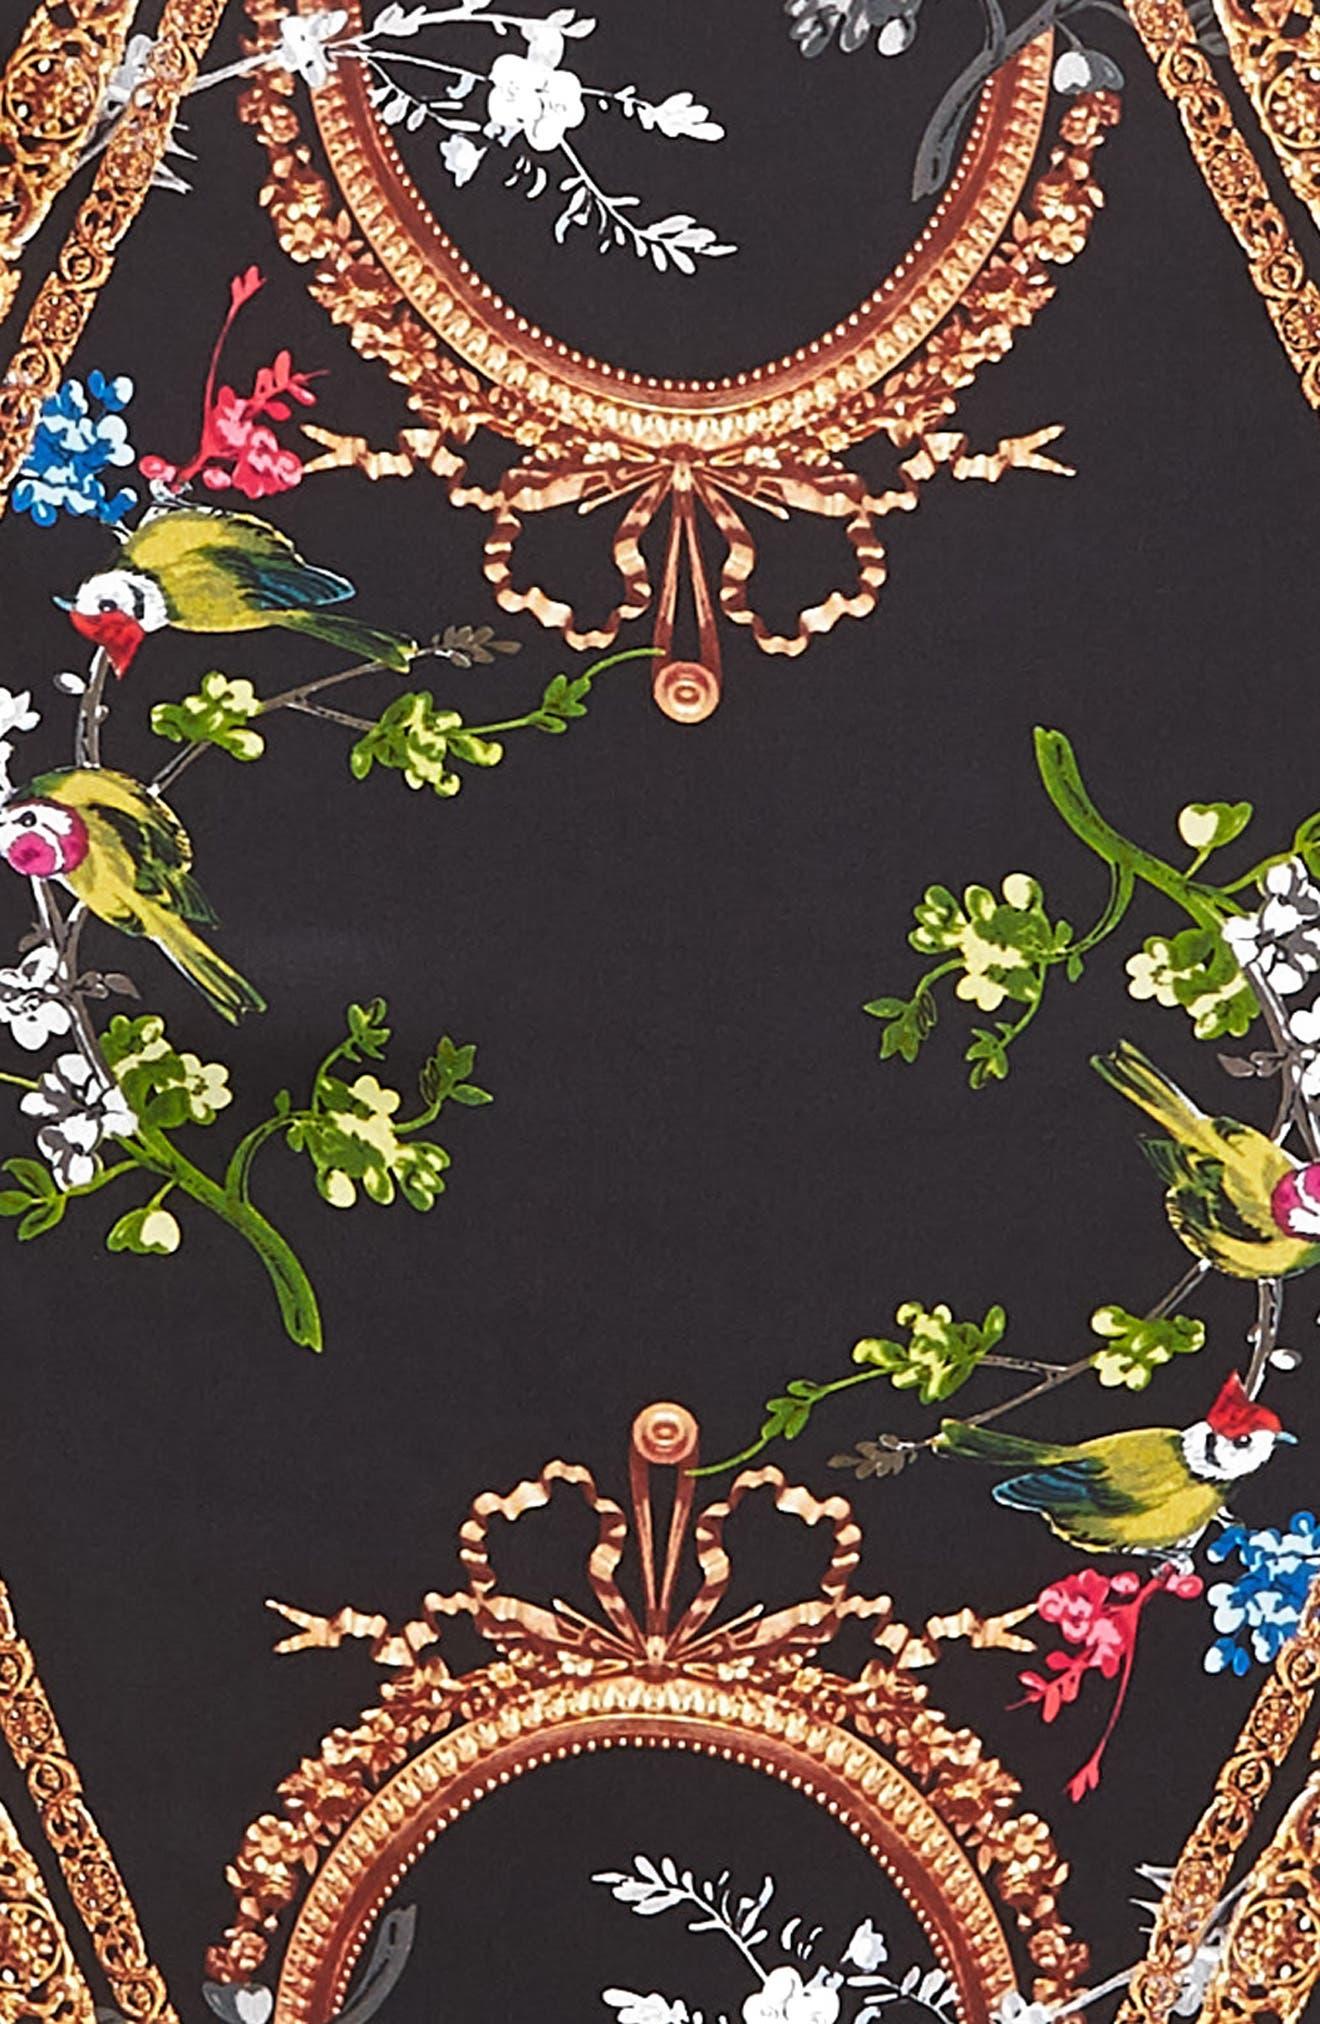 Opulent Fauna Kite Silk Scarf,                             Alternate thumbnail 4, color,                             BLACK